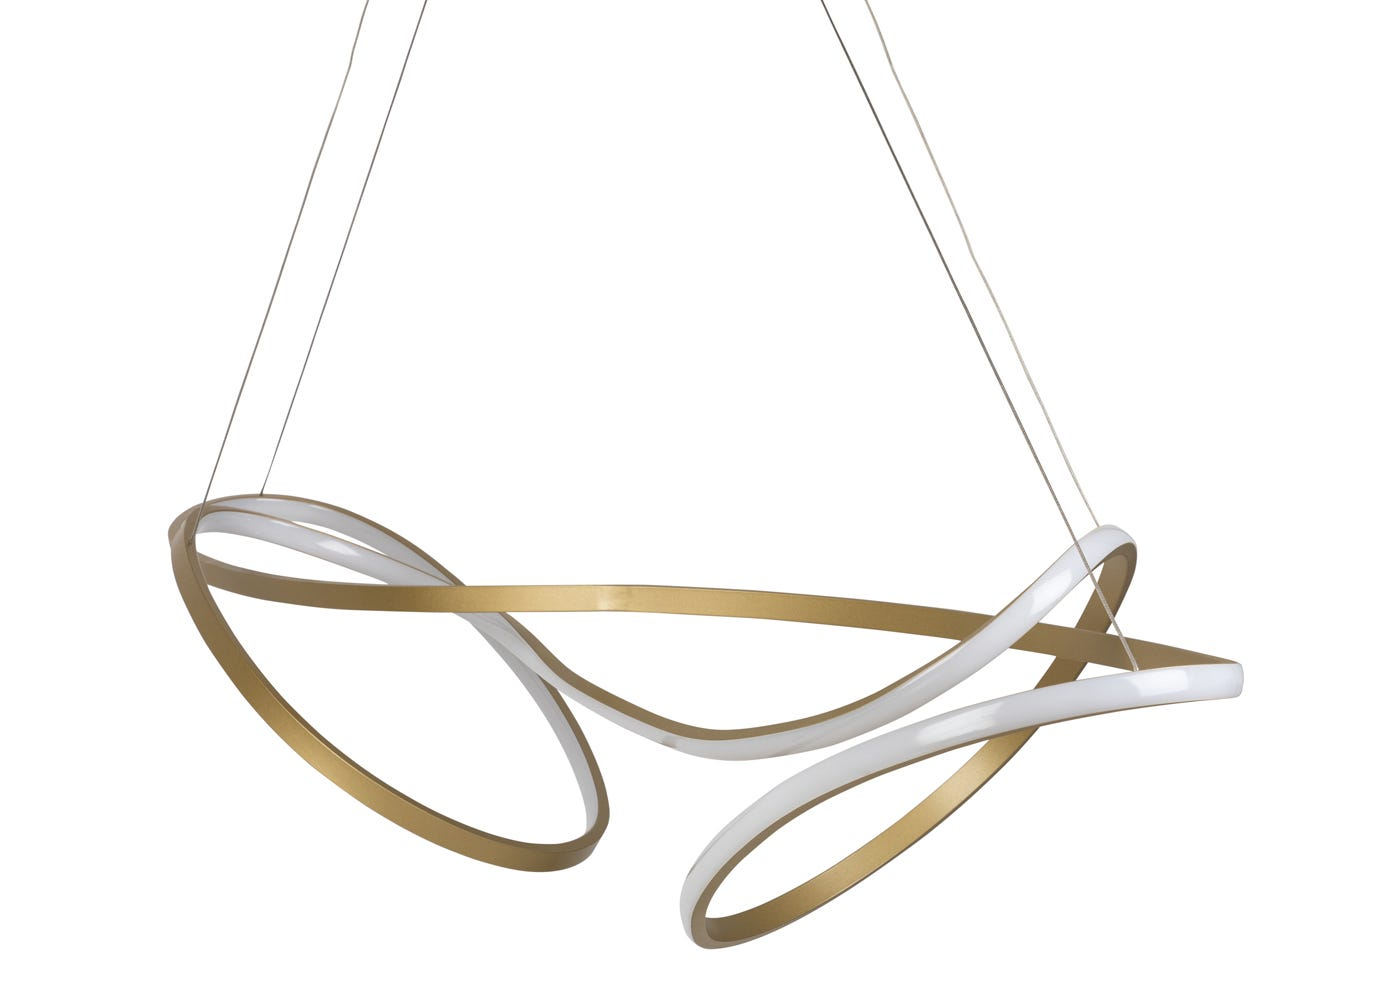 As shown: RIbbon LED Ceiling Pendant XL Satin Gold - Front profile.